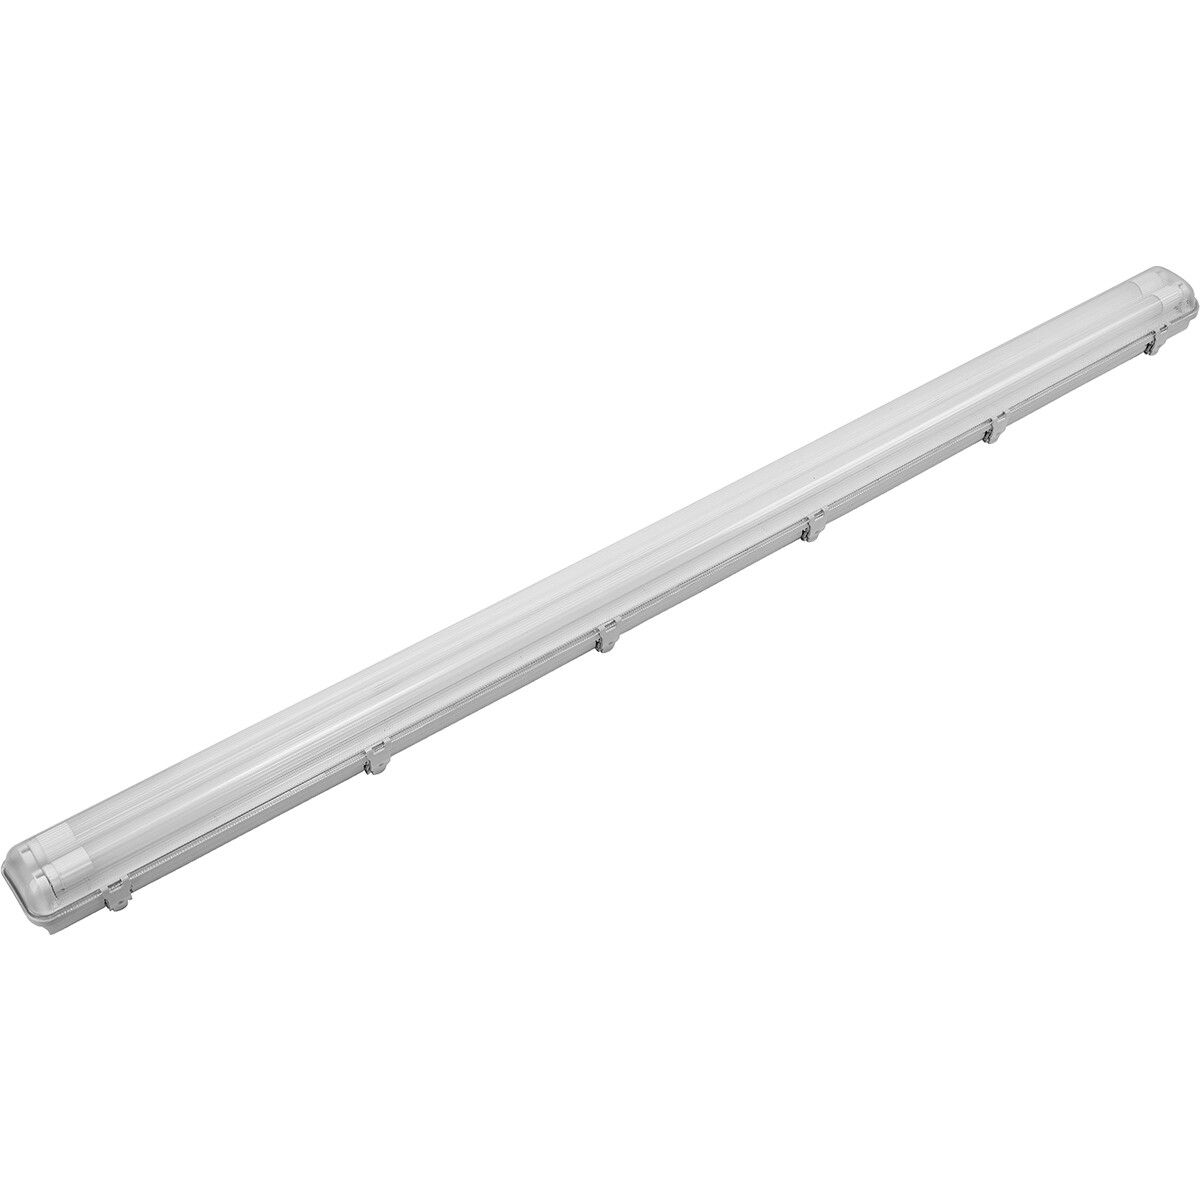 LED TL Armatuur T8 - Pragmi Housing Pro - 150cm Dubbel - Waterdicht IP65